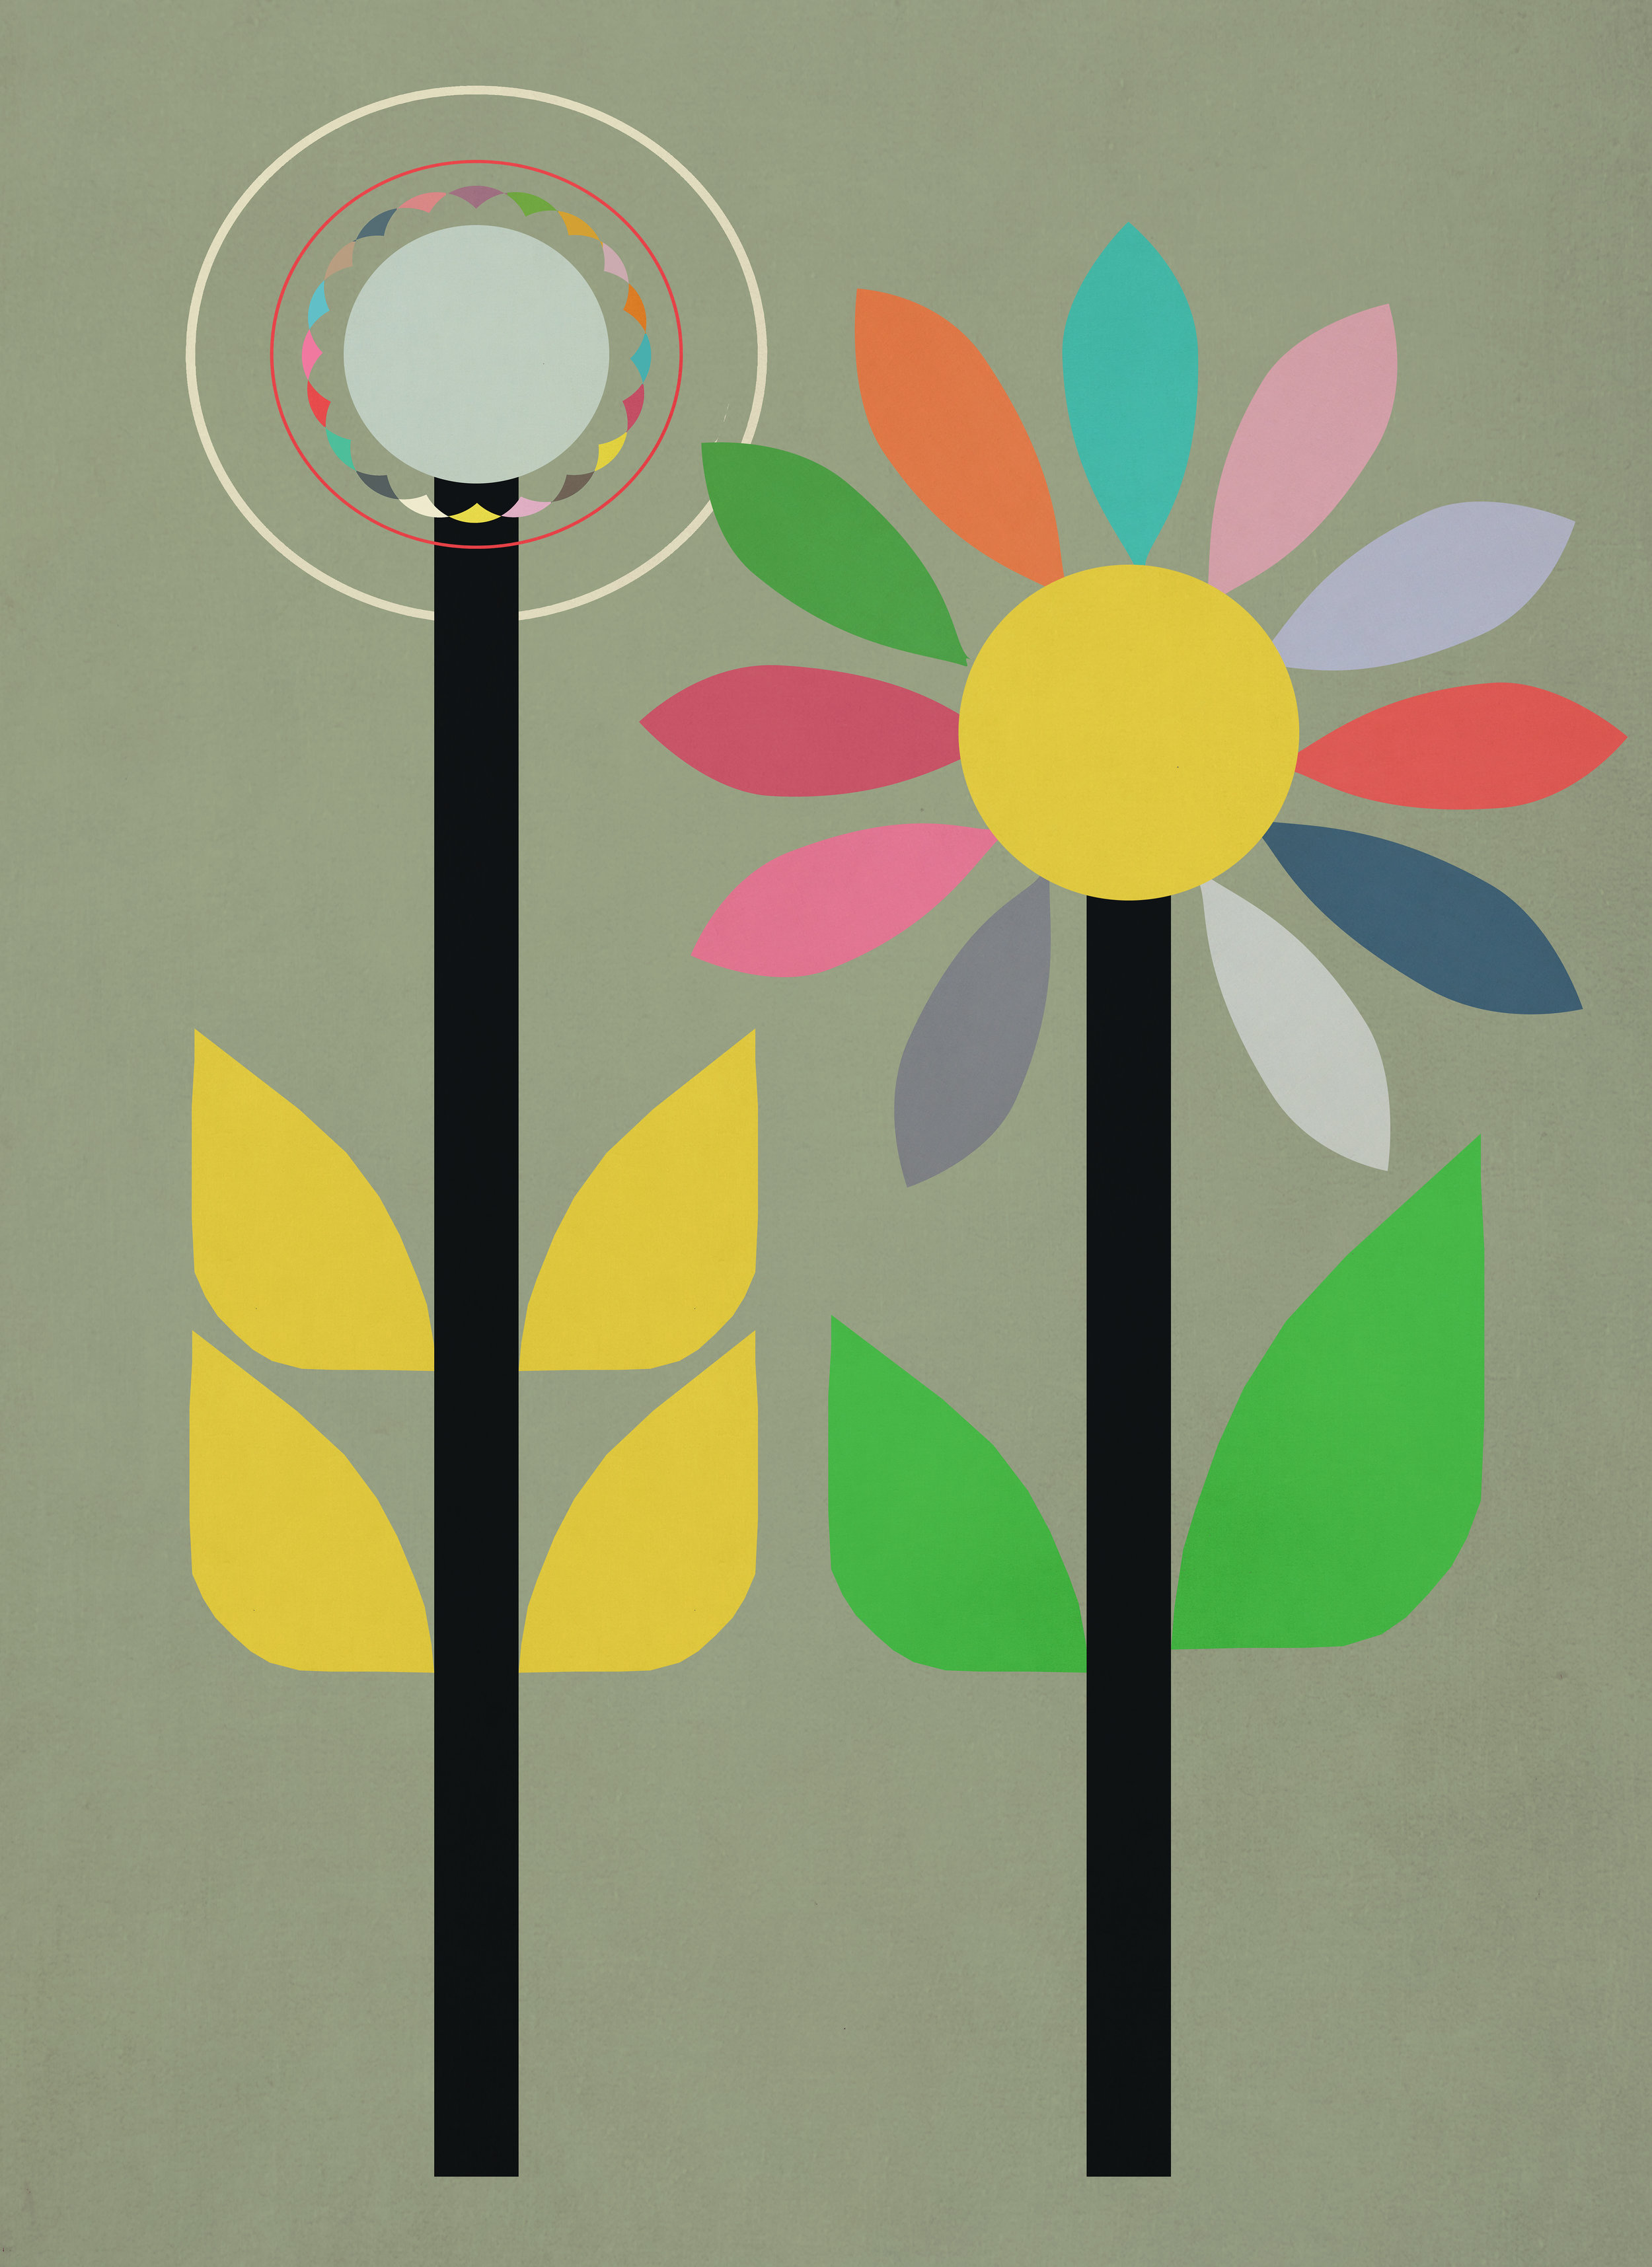 flower 3 sm.jpg